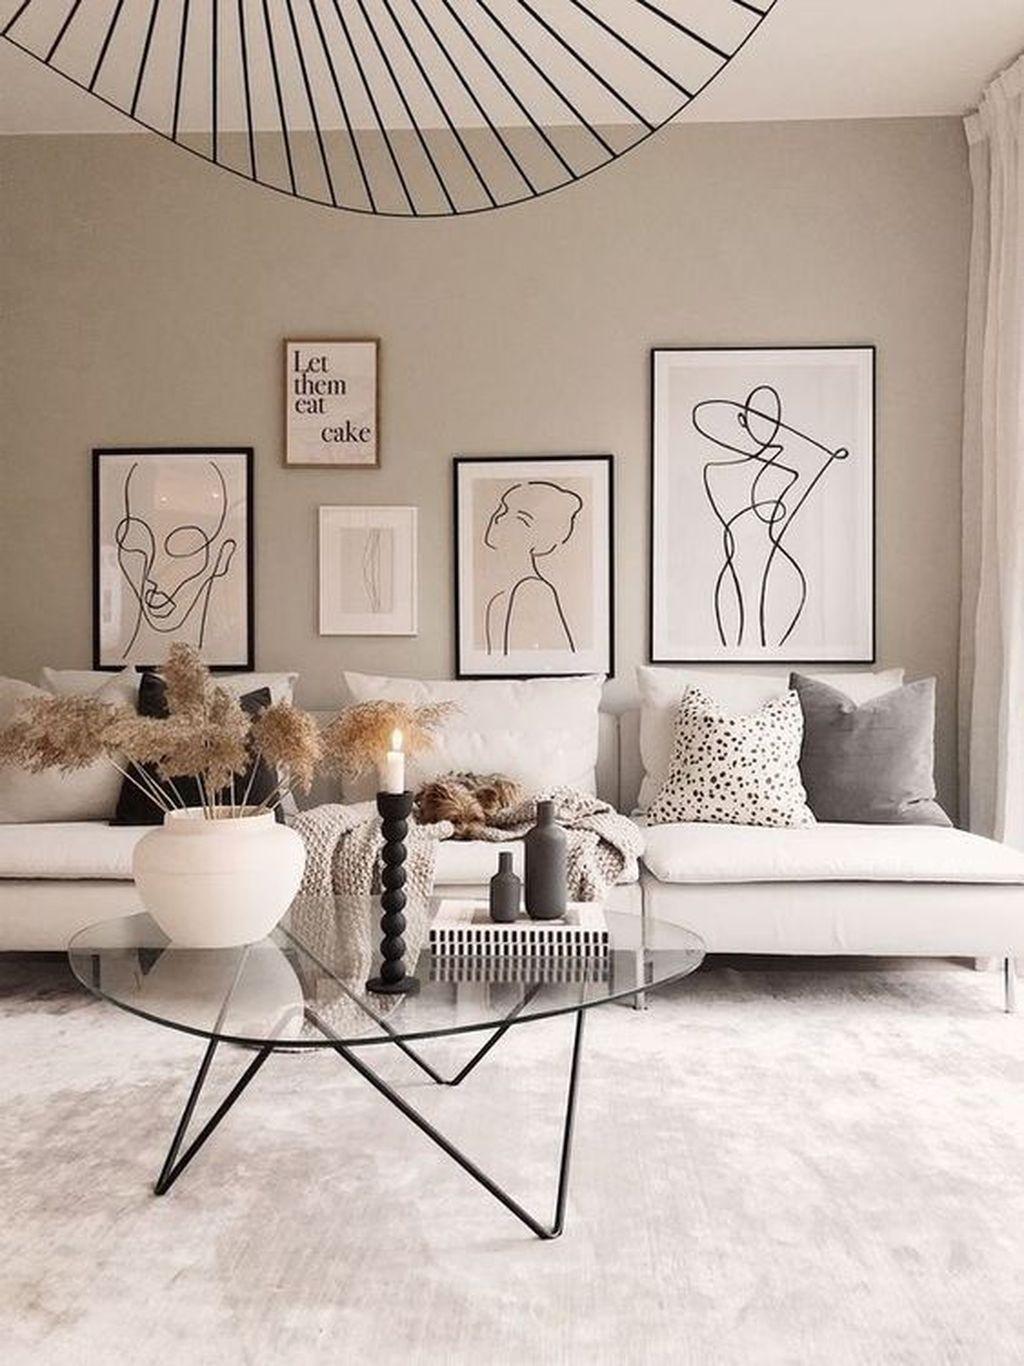 30 Marvelous Scandinavian Interior Design To Upgrade The Beautiful Of Your Living Room In 2020 Scandi Living Room Luxury Living Room Living Room Scandinavian